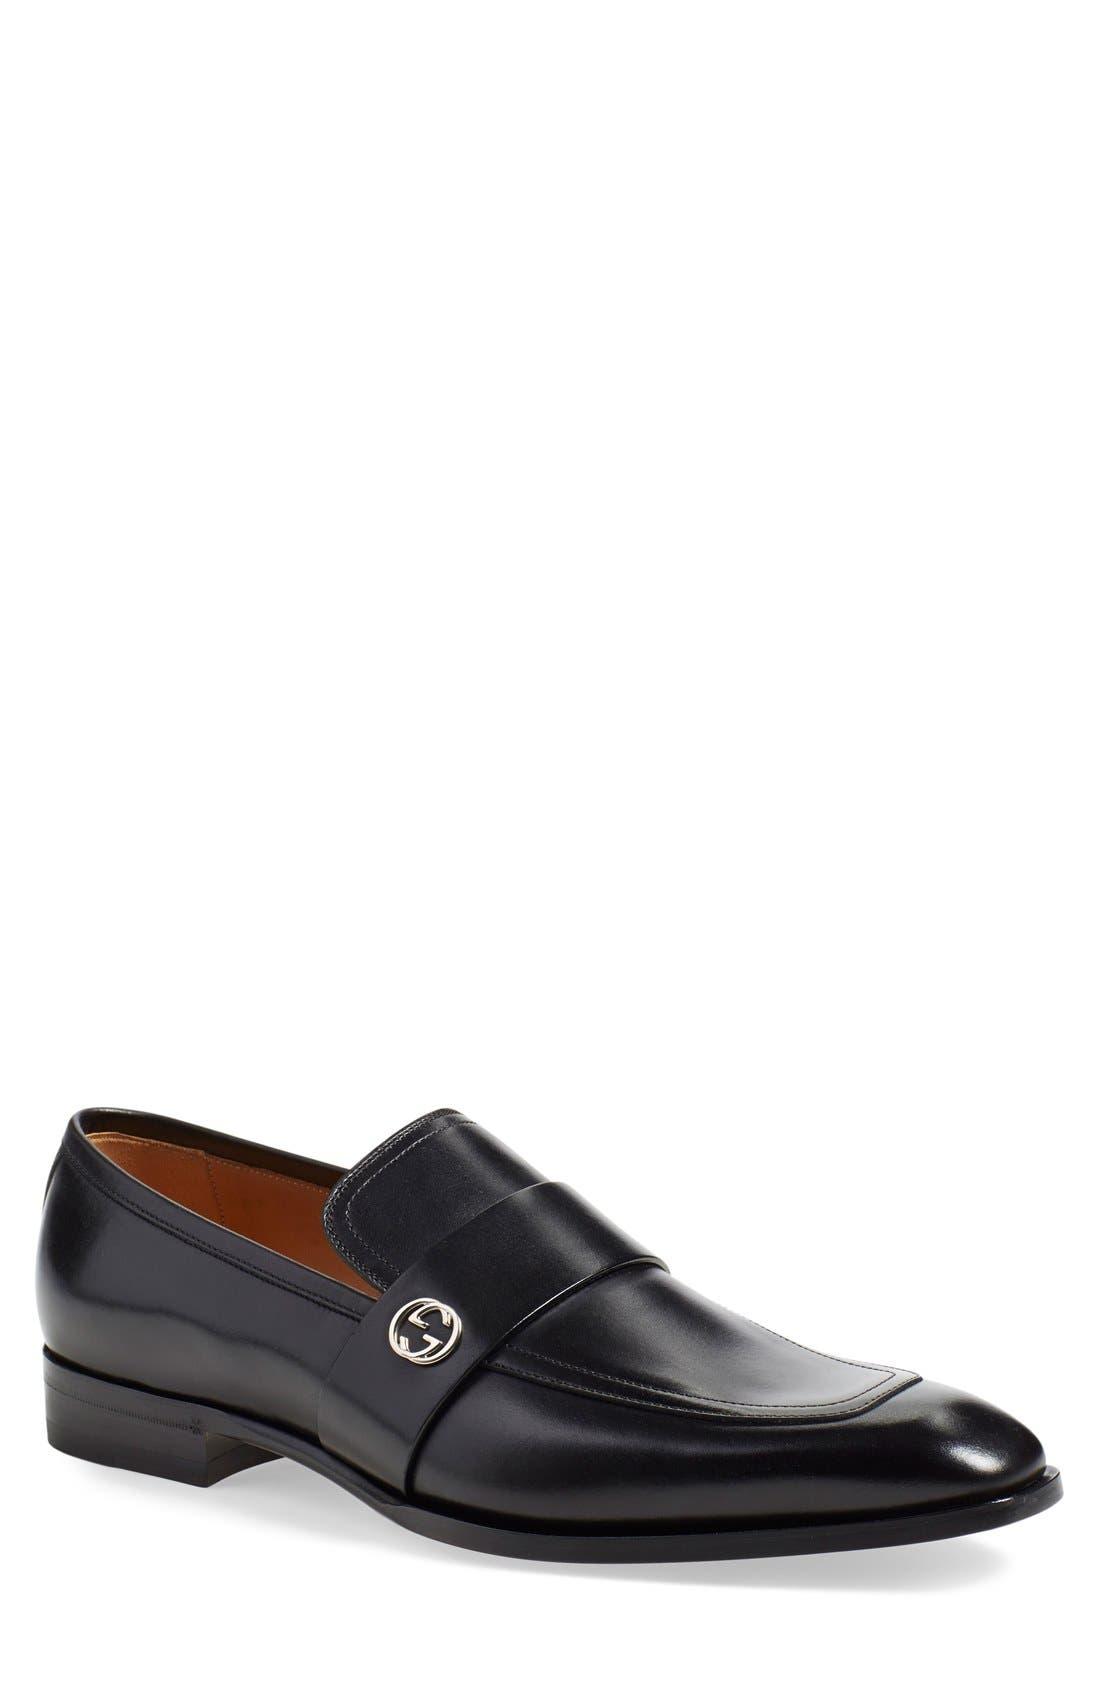 'Broadwick' Loafer,                         Main,                         color, 001